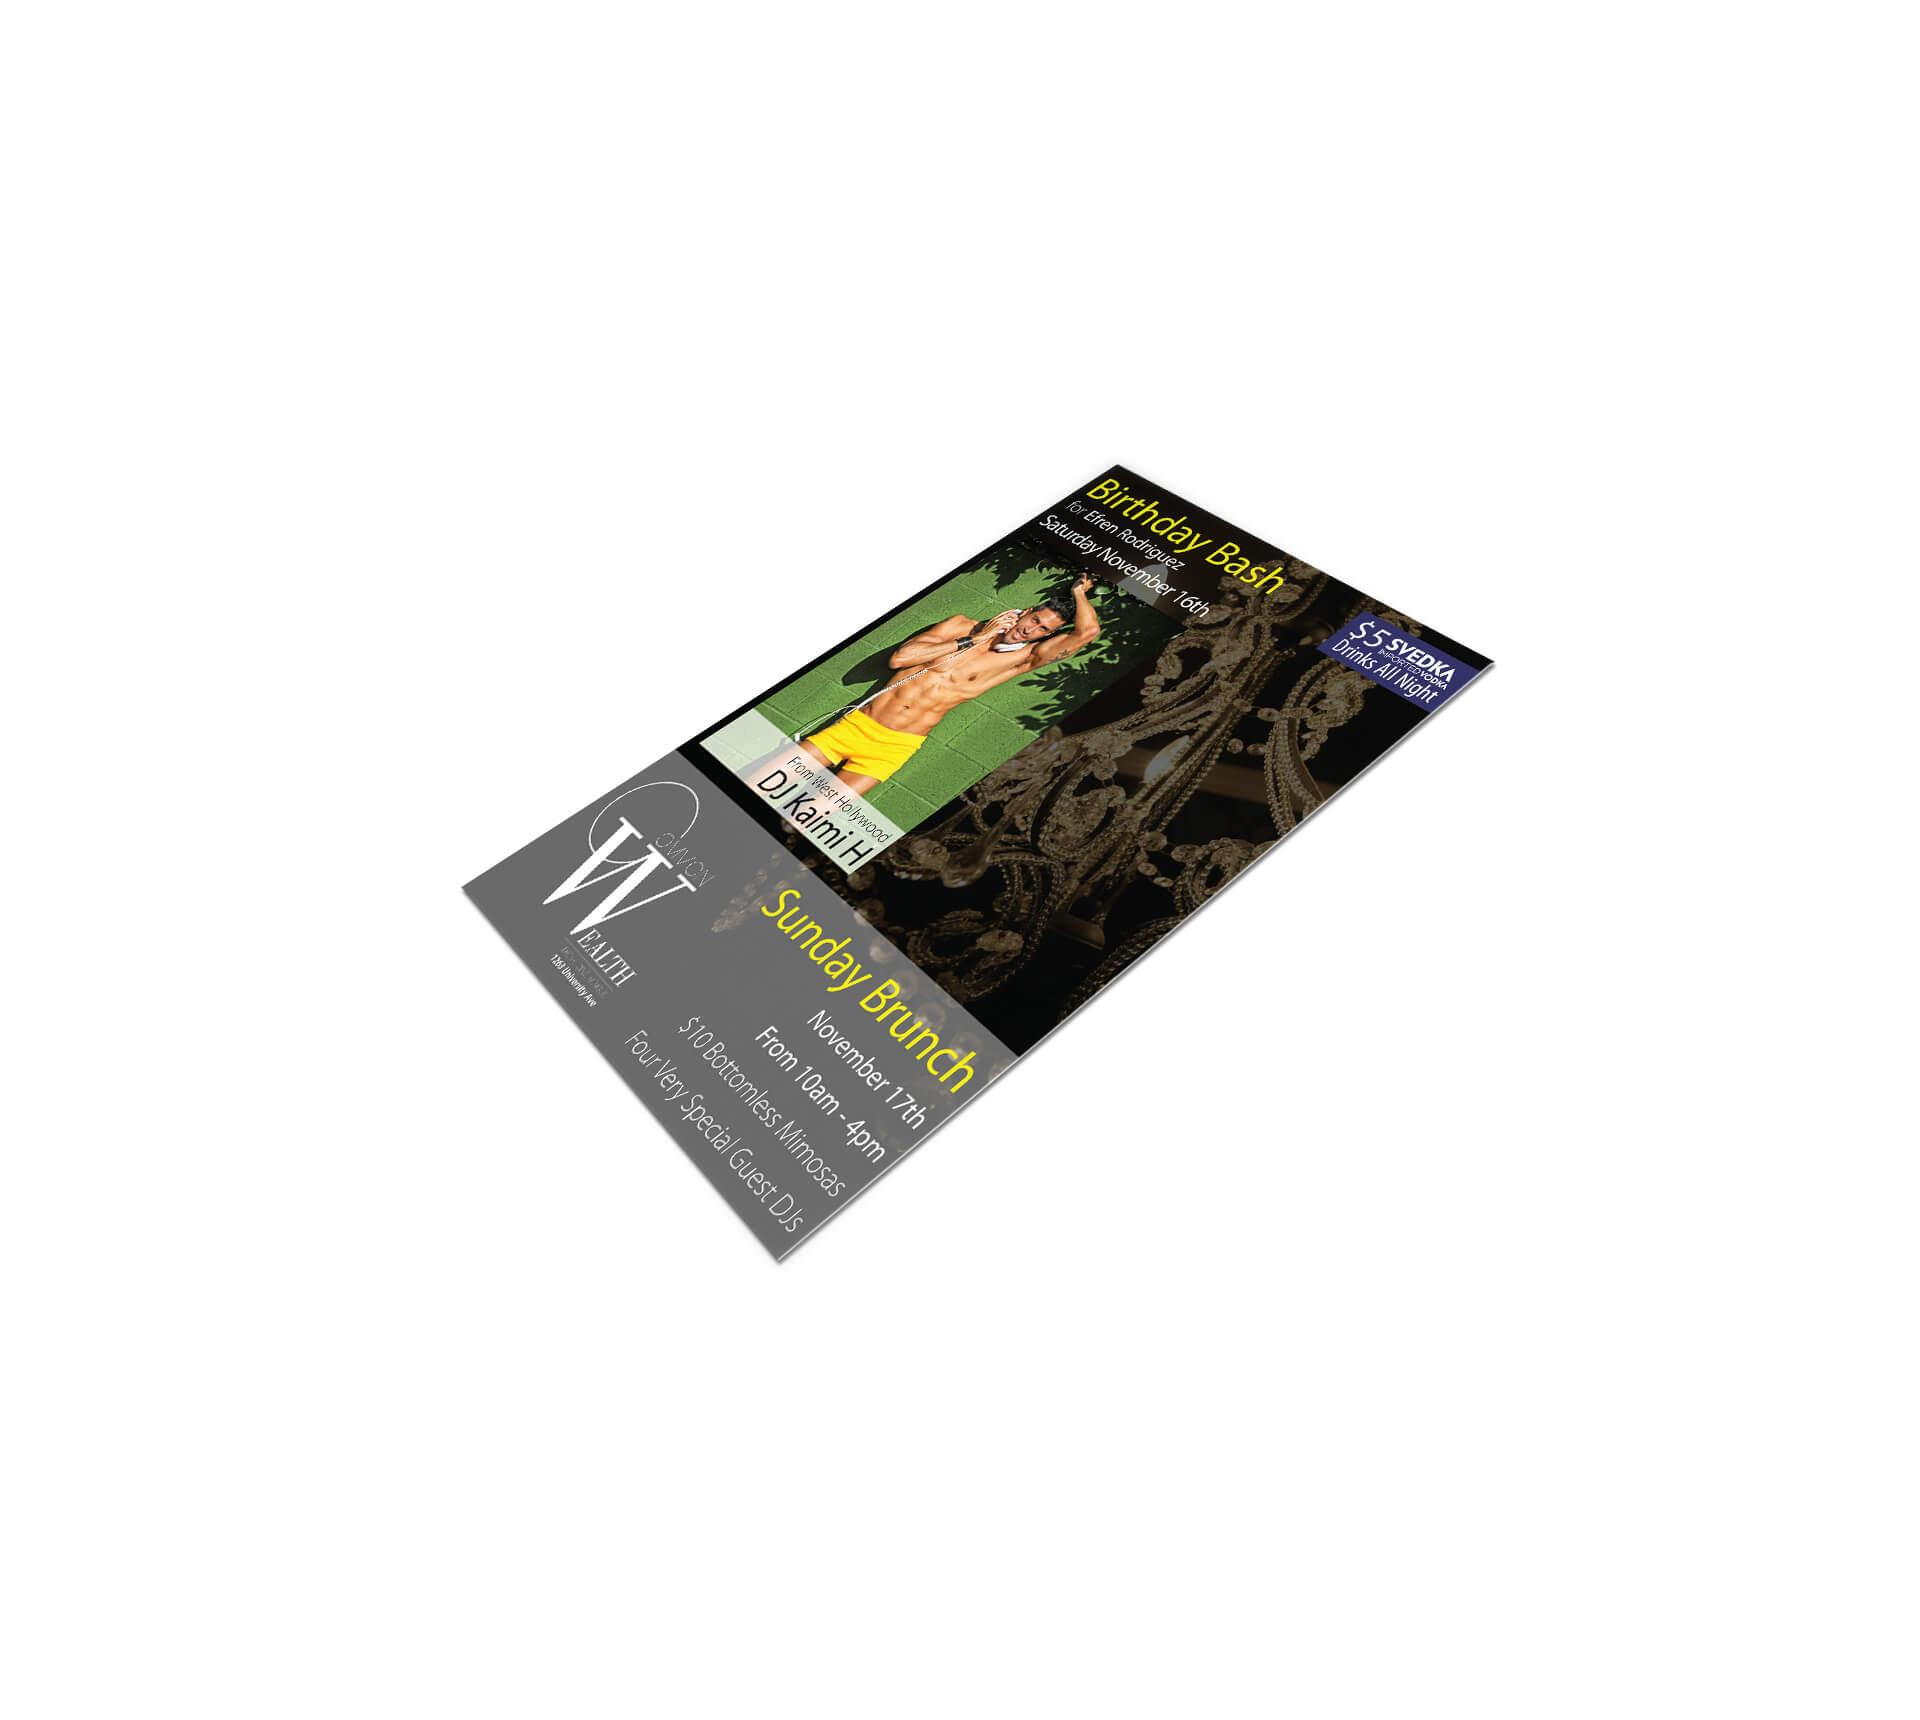 Commonwealth SD – Promo Flyer Design